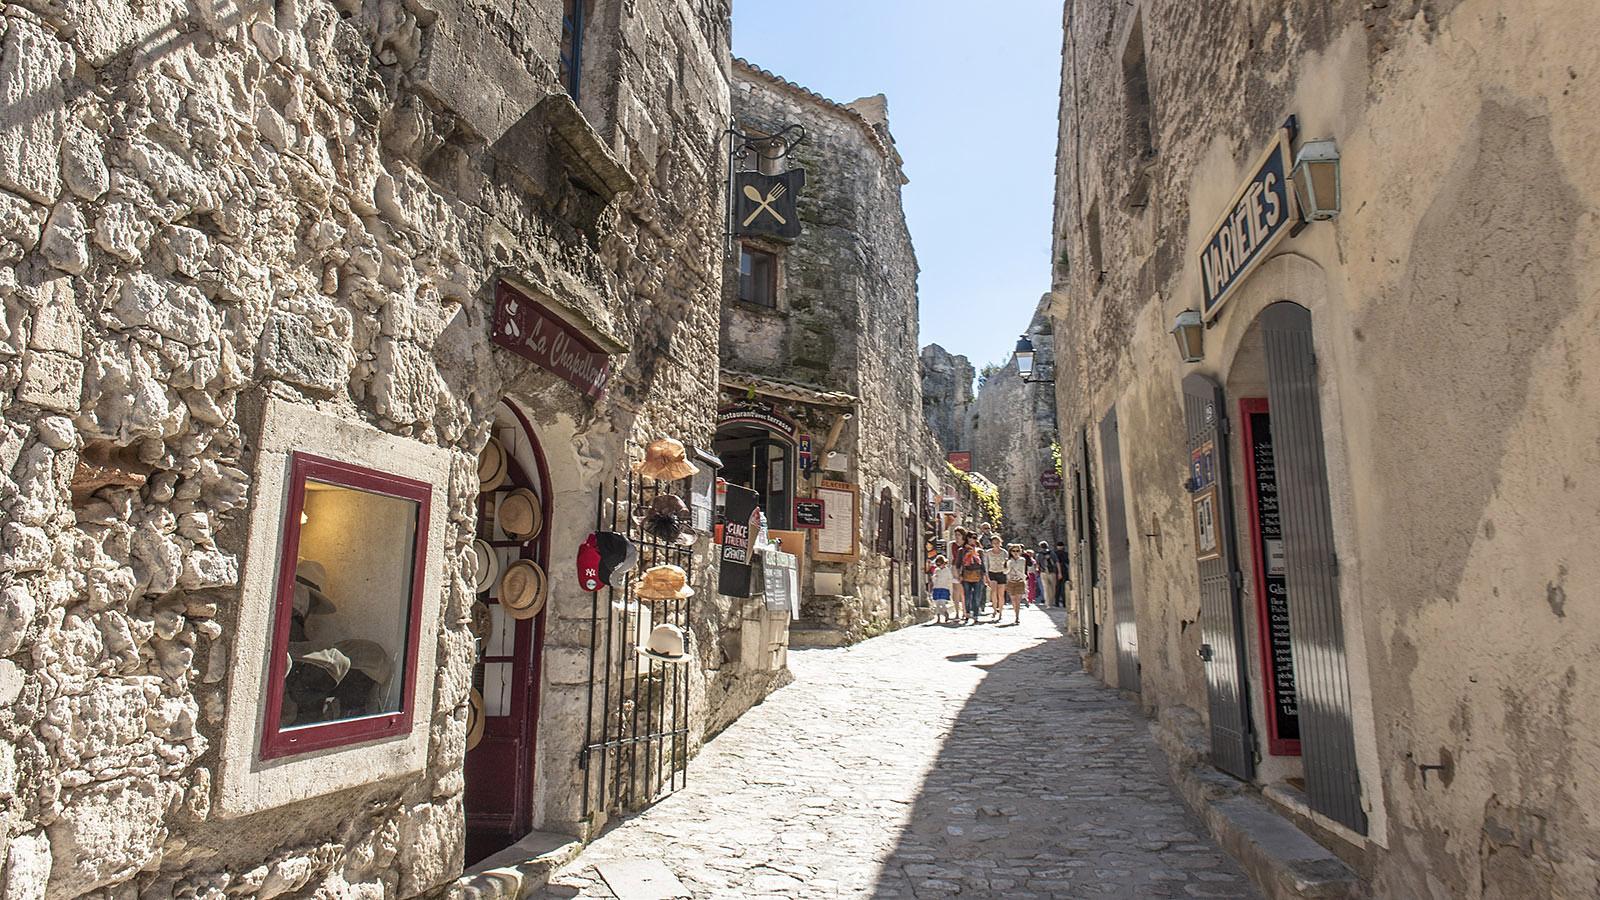 In den Gassen von Les Baux-de-Provence. Foto: Hilke Maunder